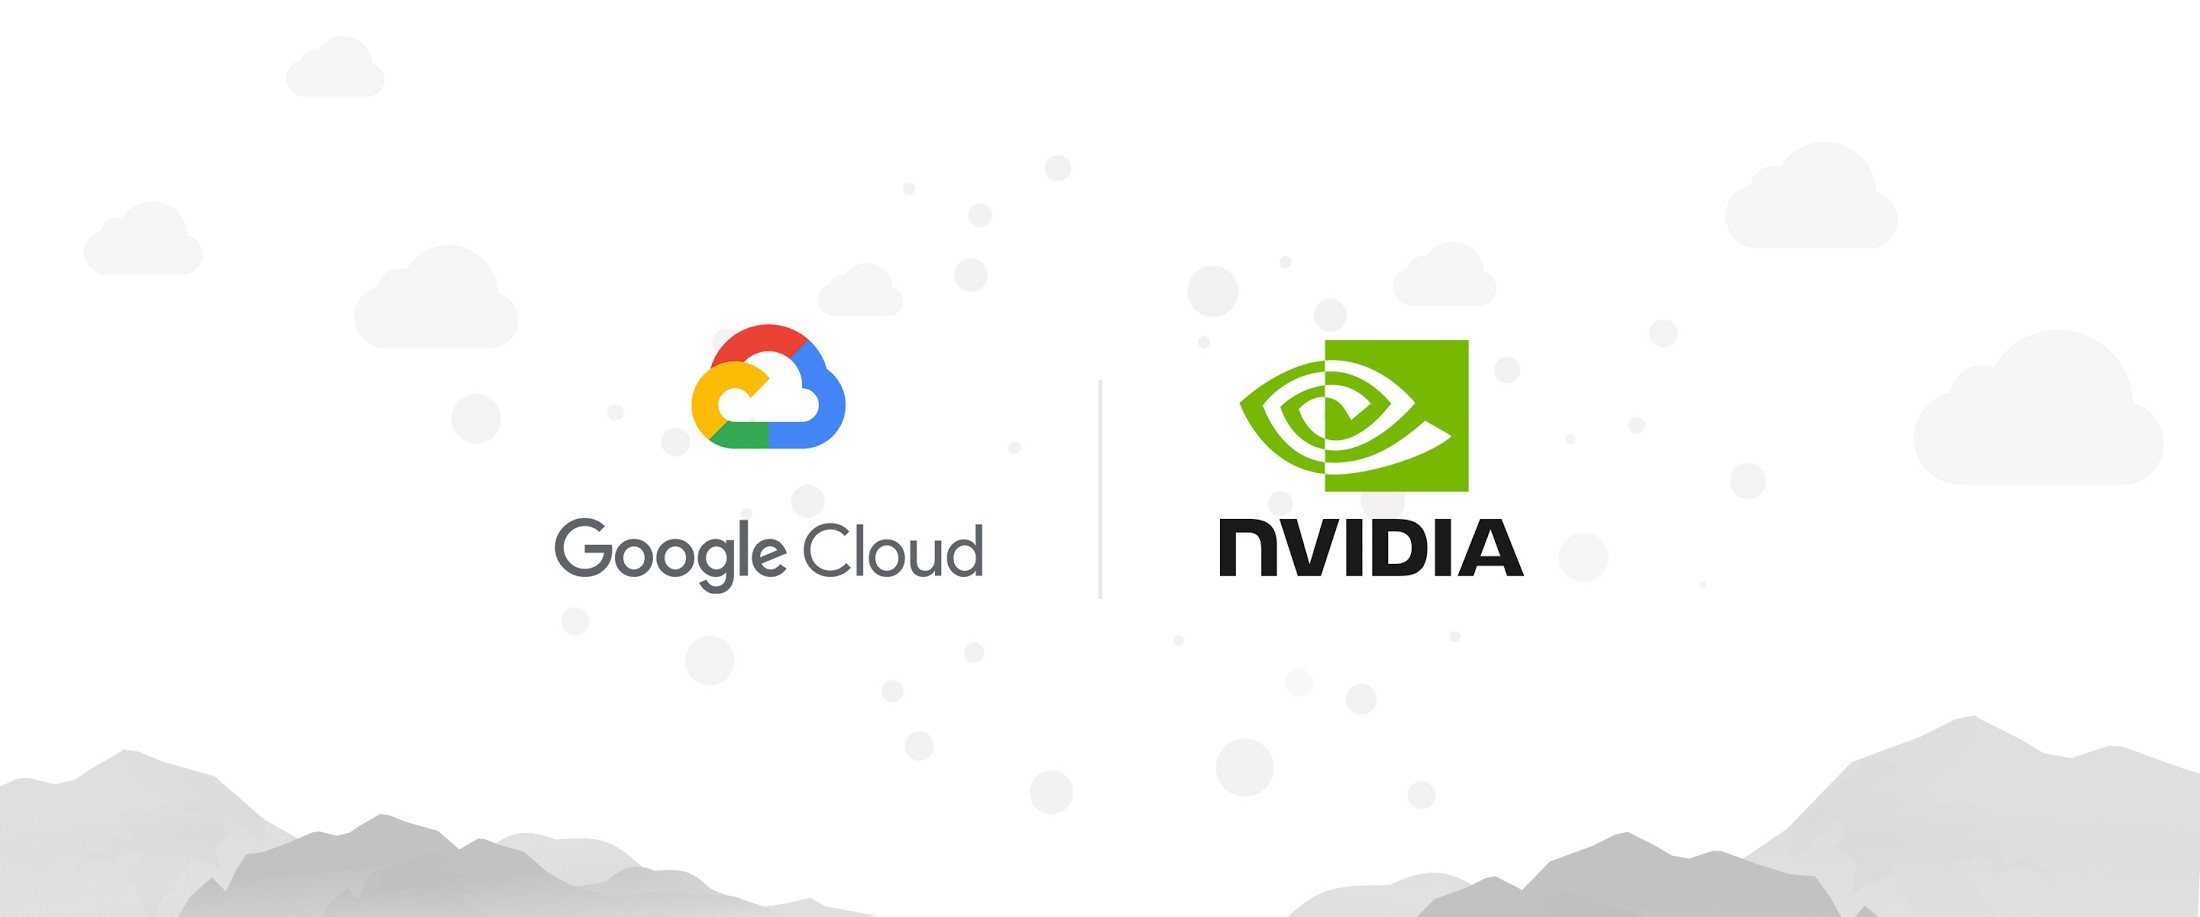 Google Cloud and NVIDIA's enhanced partnership accelerates computing workloads